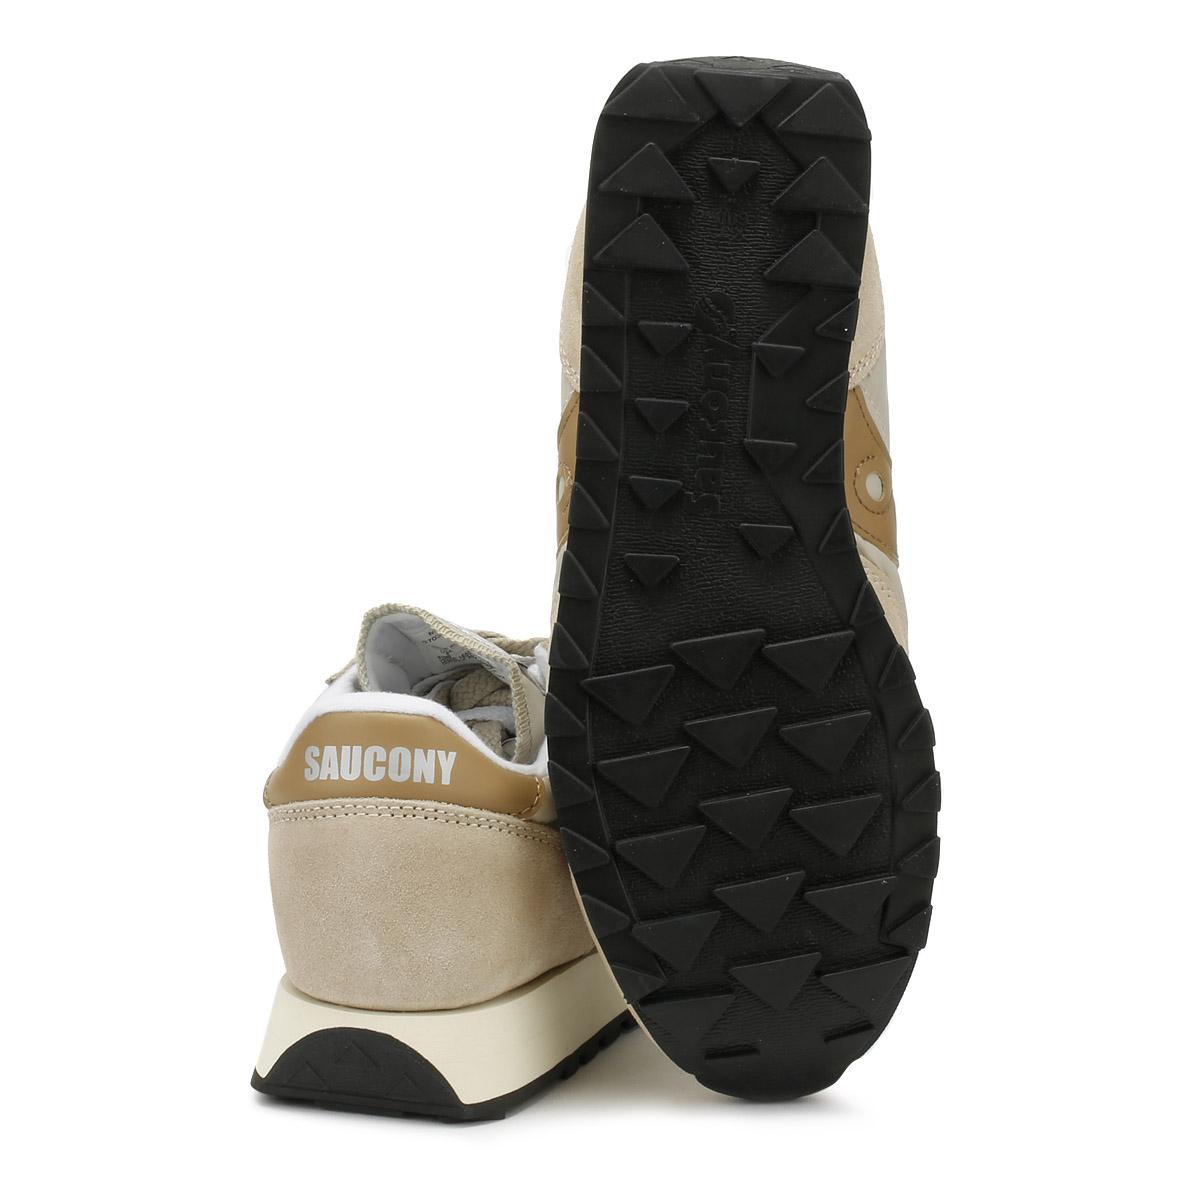 Saucony Mens Tan Trainers Cement & Tan Mens Jazz Original Vintage Sport Casual Shoes 72ba29